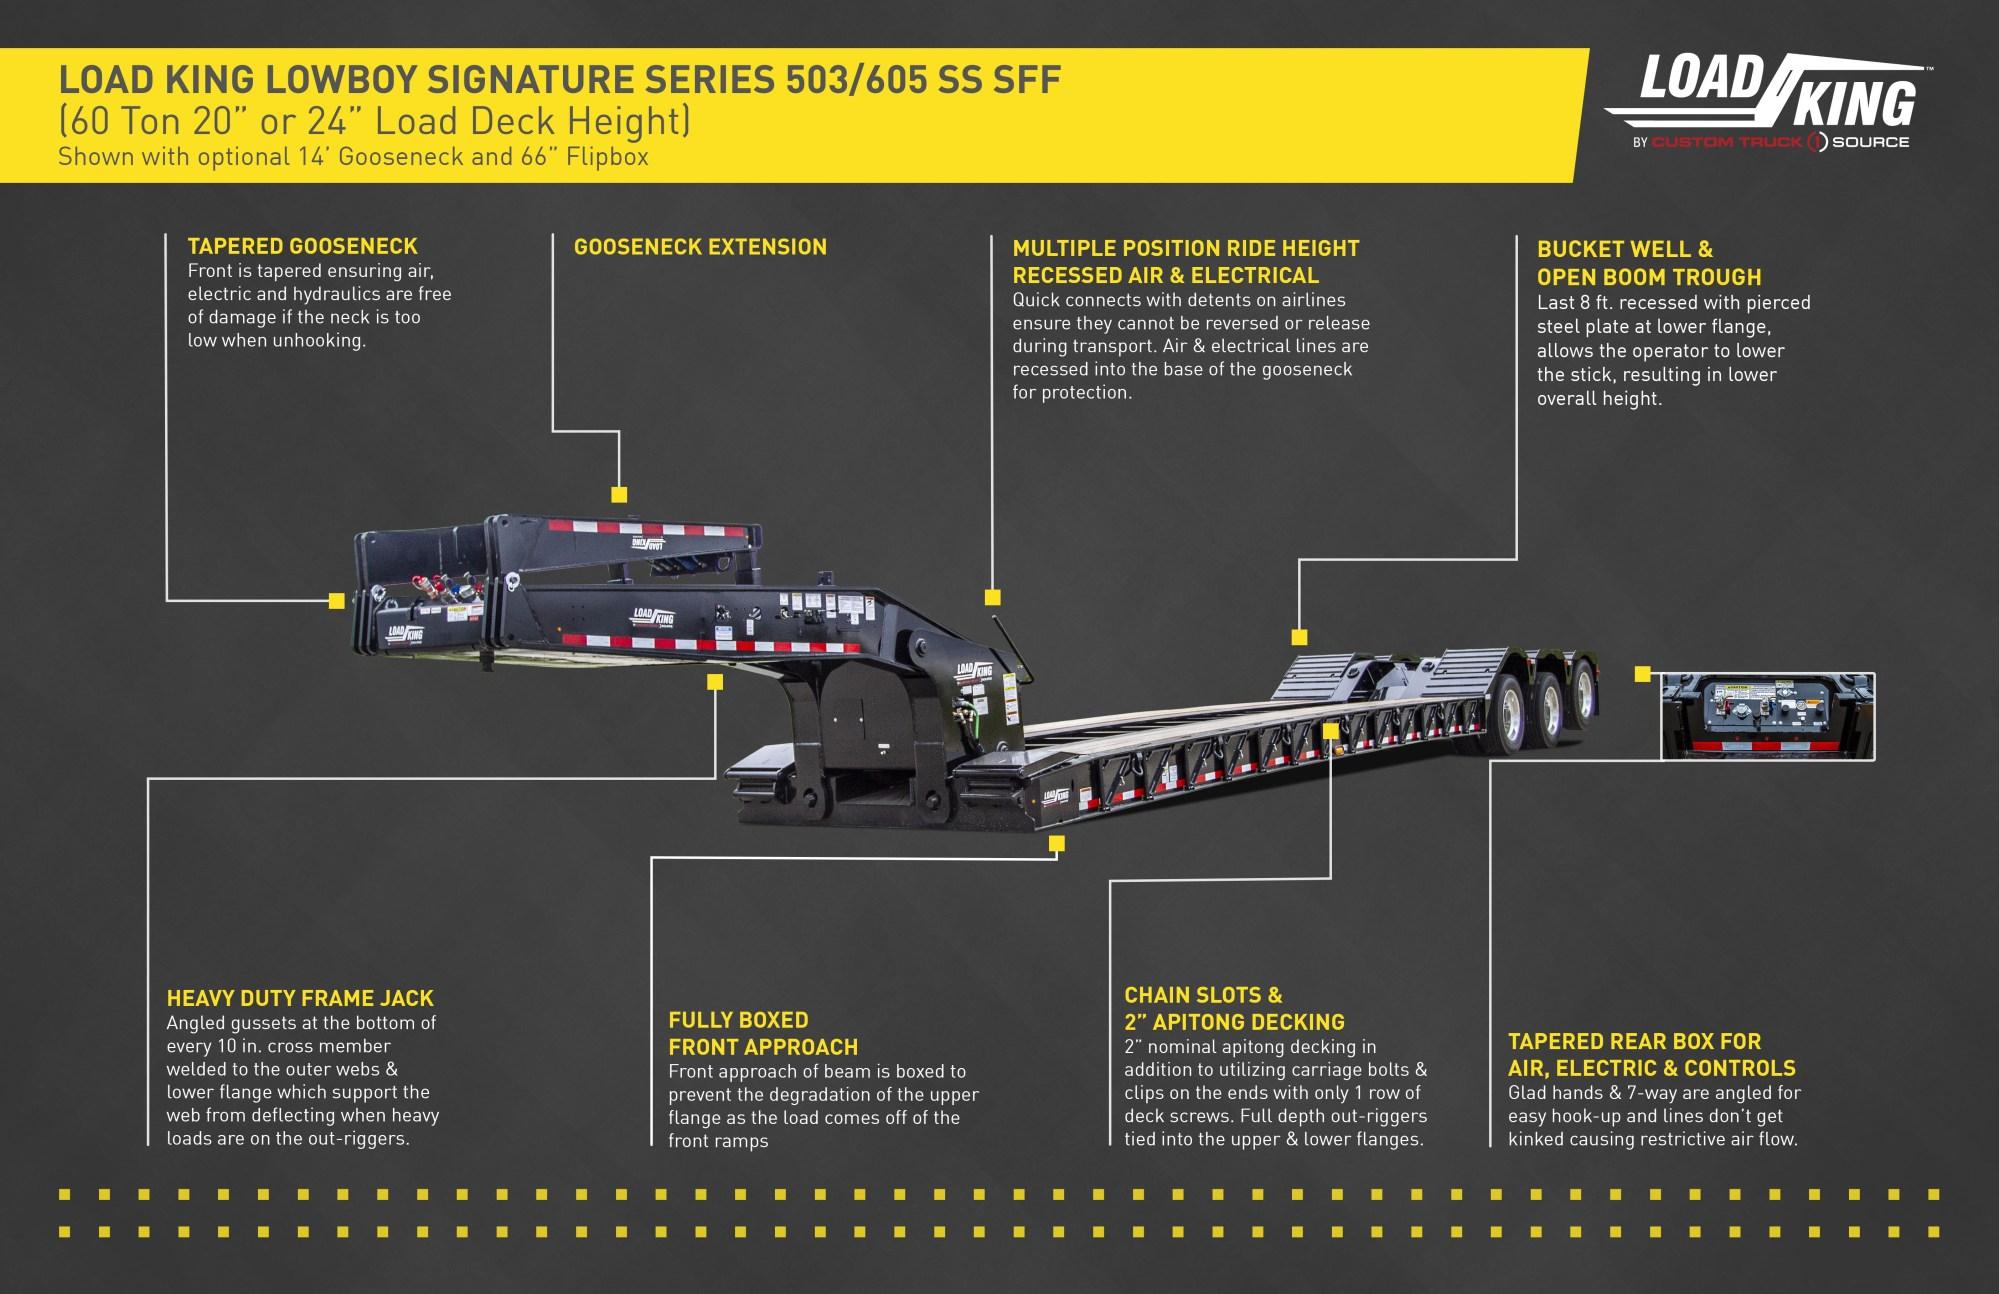 hight resolution of lk 60 ton infographic